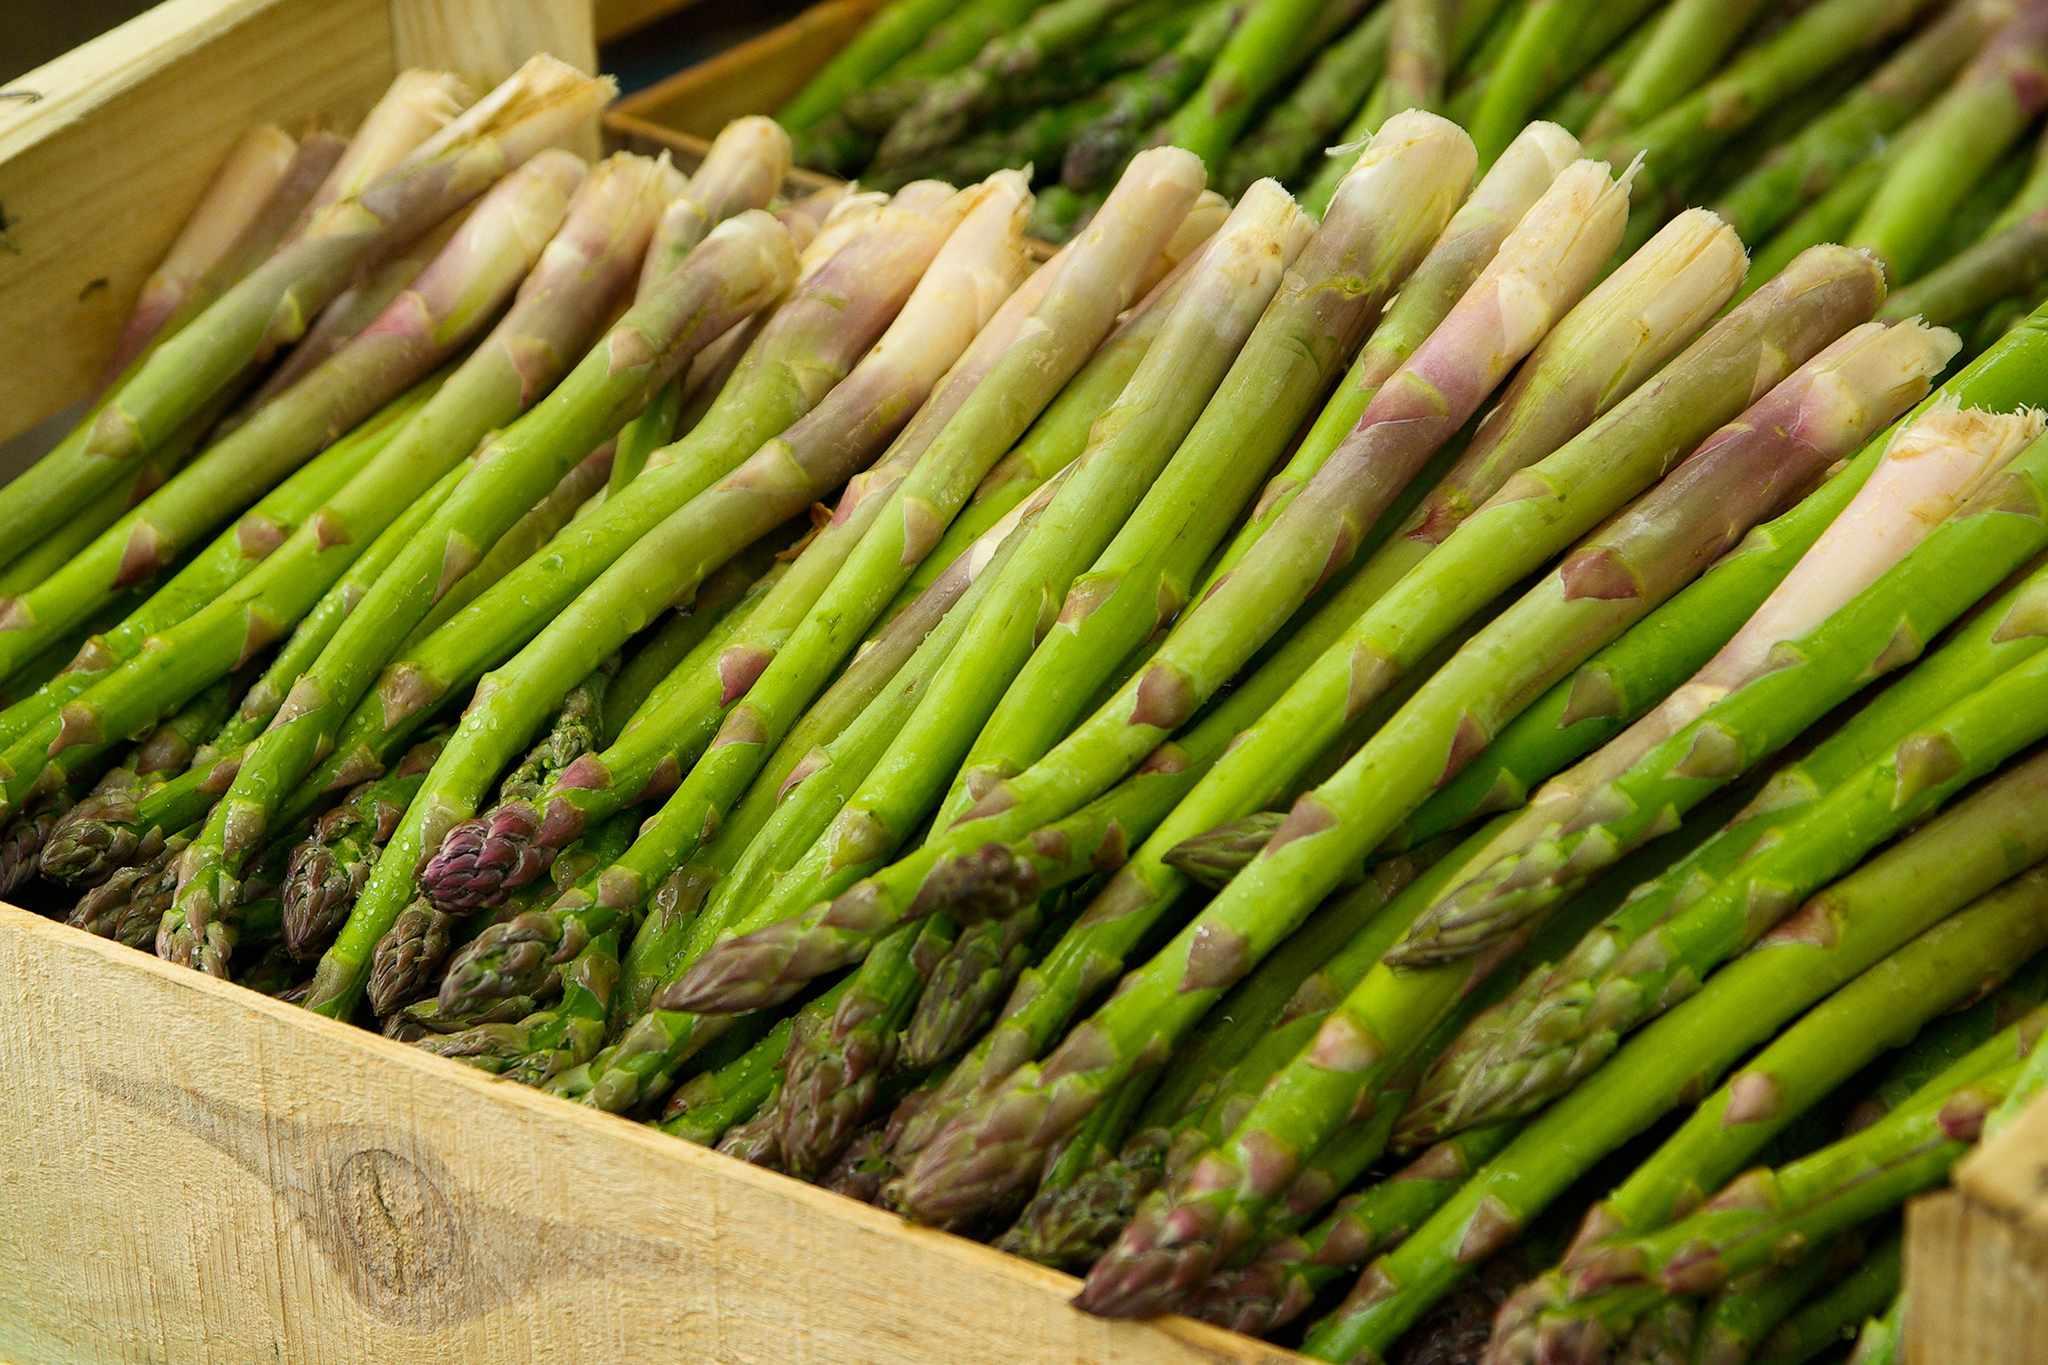 hayloft-asparagus-saver-collection-variety-millenium-2048-1365